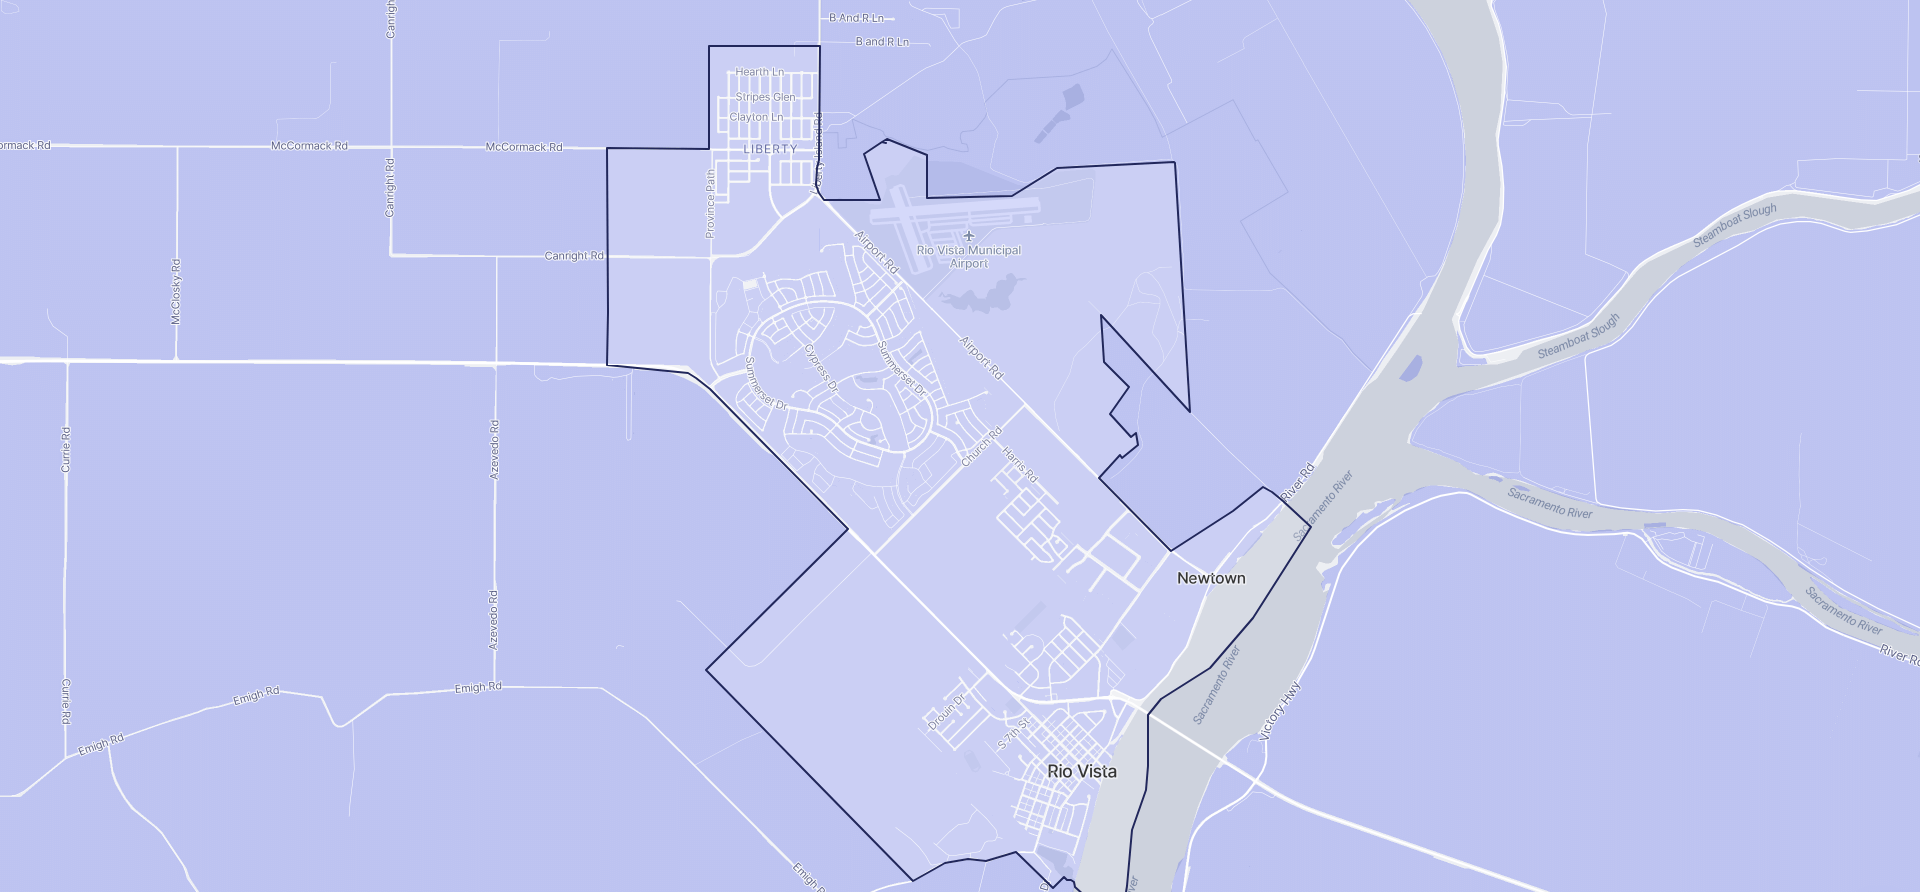 Image of Rio Vista boundaries on a map.